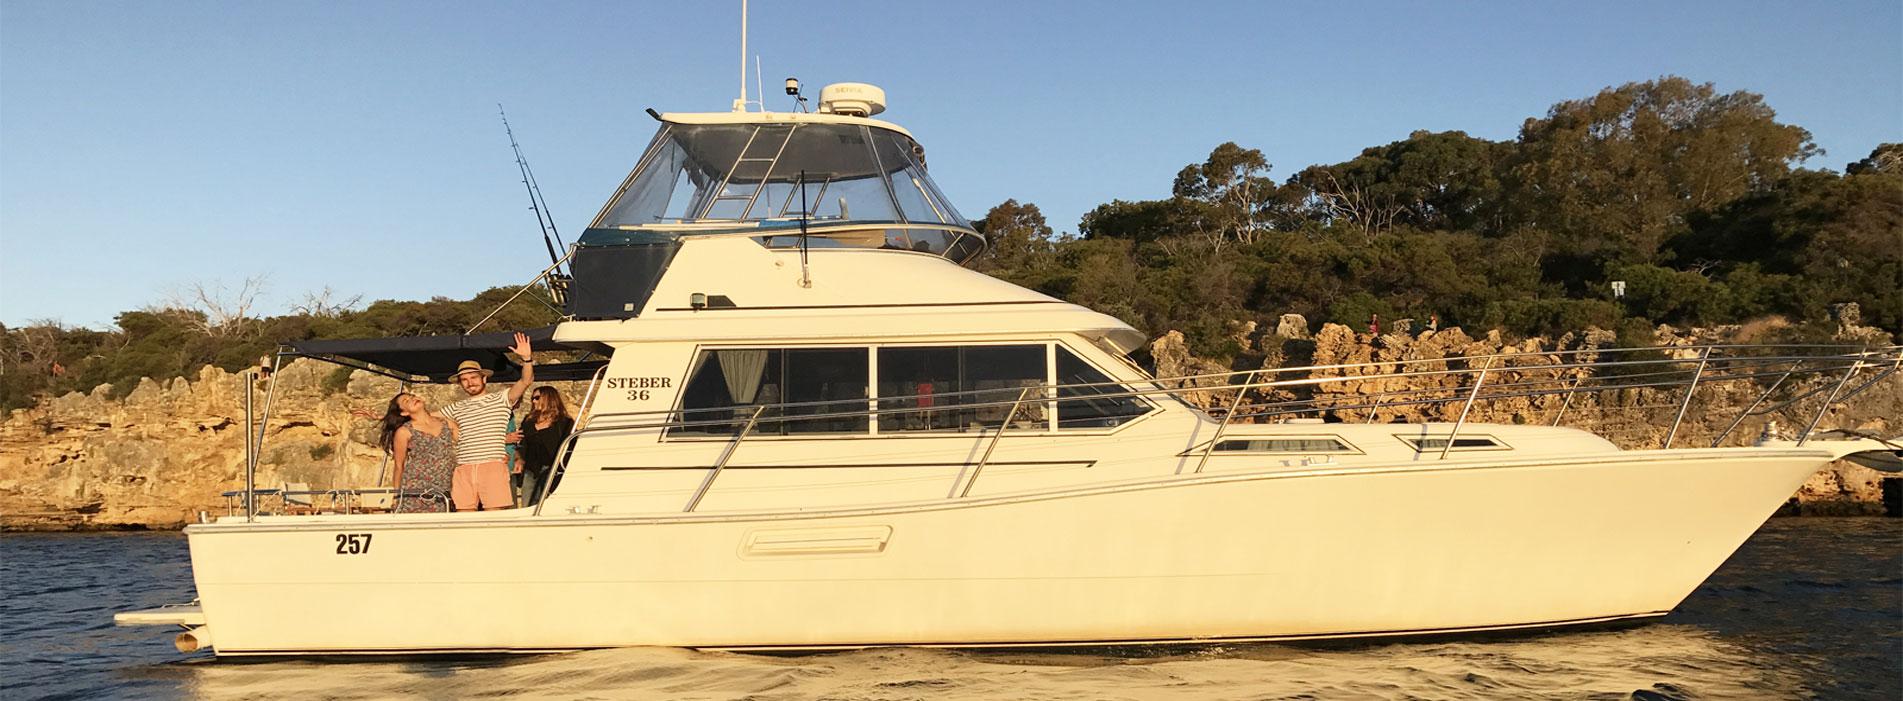 MOONSHINE-II-boat-charter-hire-Perth-WA-Swan-River-Rottnest-Island